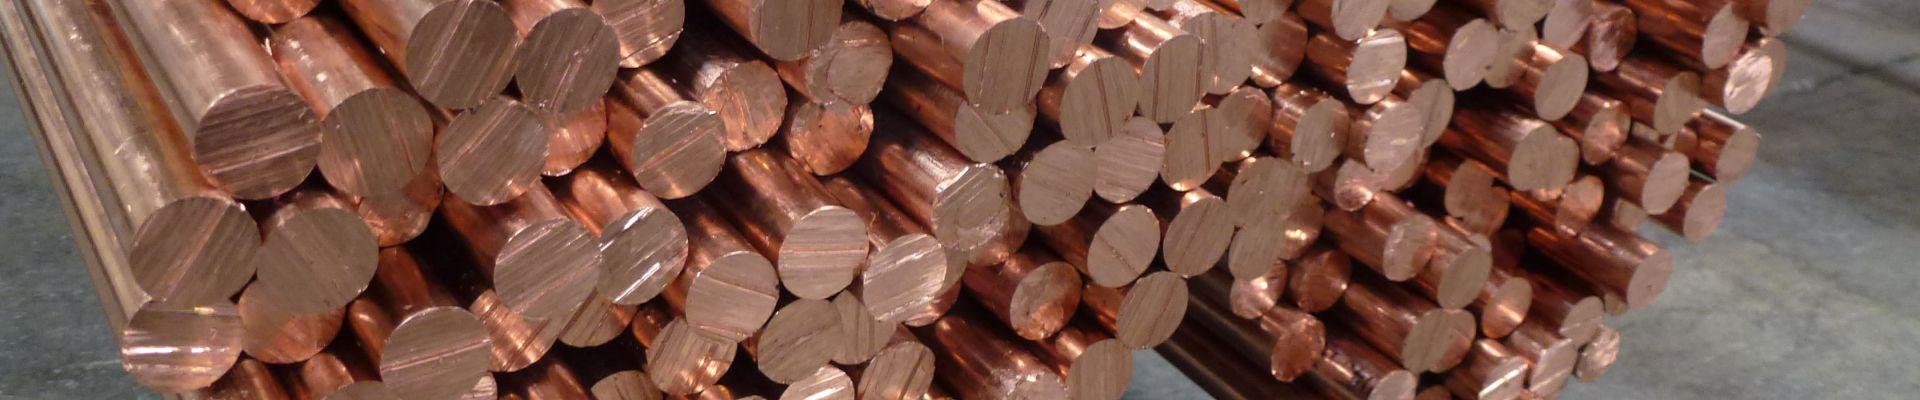 Barre de cuivre